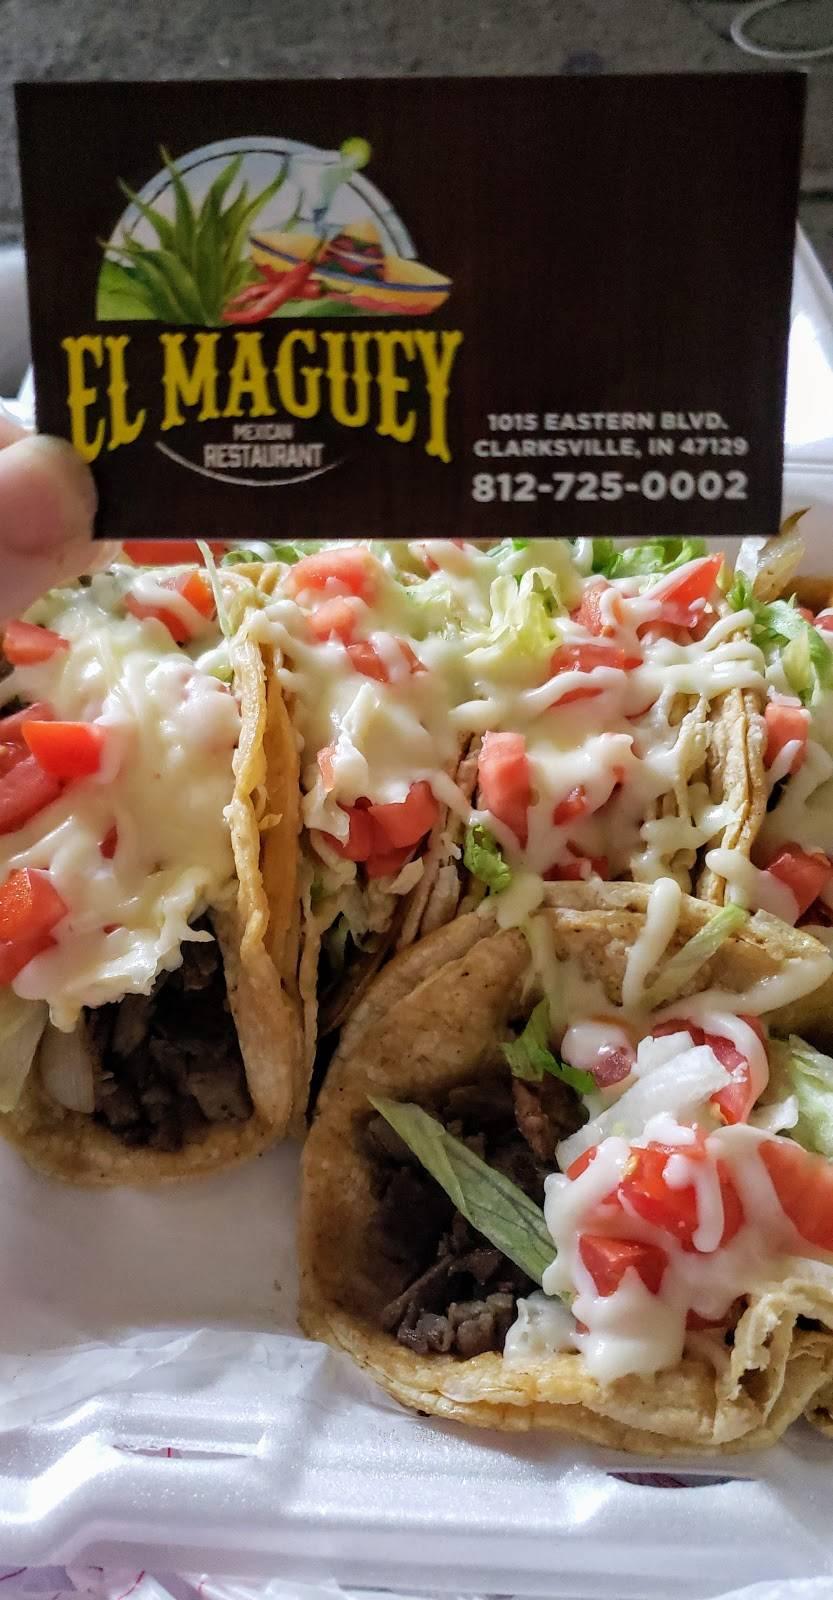 El MAGUEY - restaurant  | Photo 3 of 8 | Address: 1015 Eastern Blvd, Clarksville, IN 47129, USA | Phone: (812) 725-0002